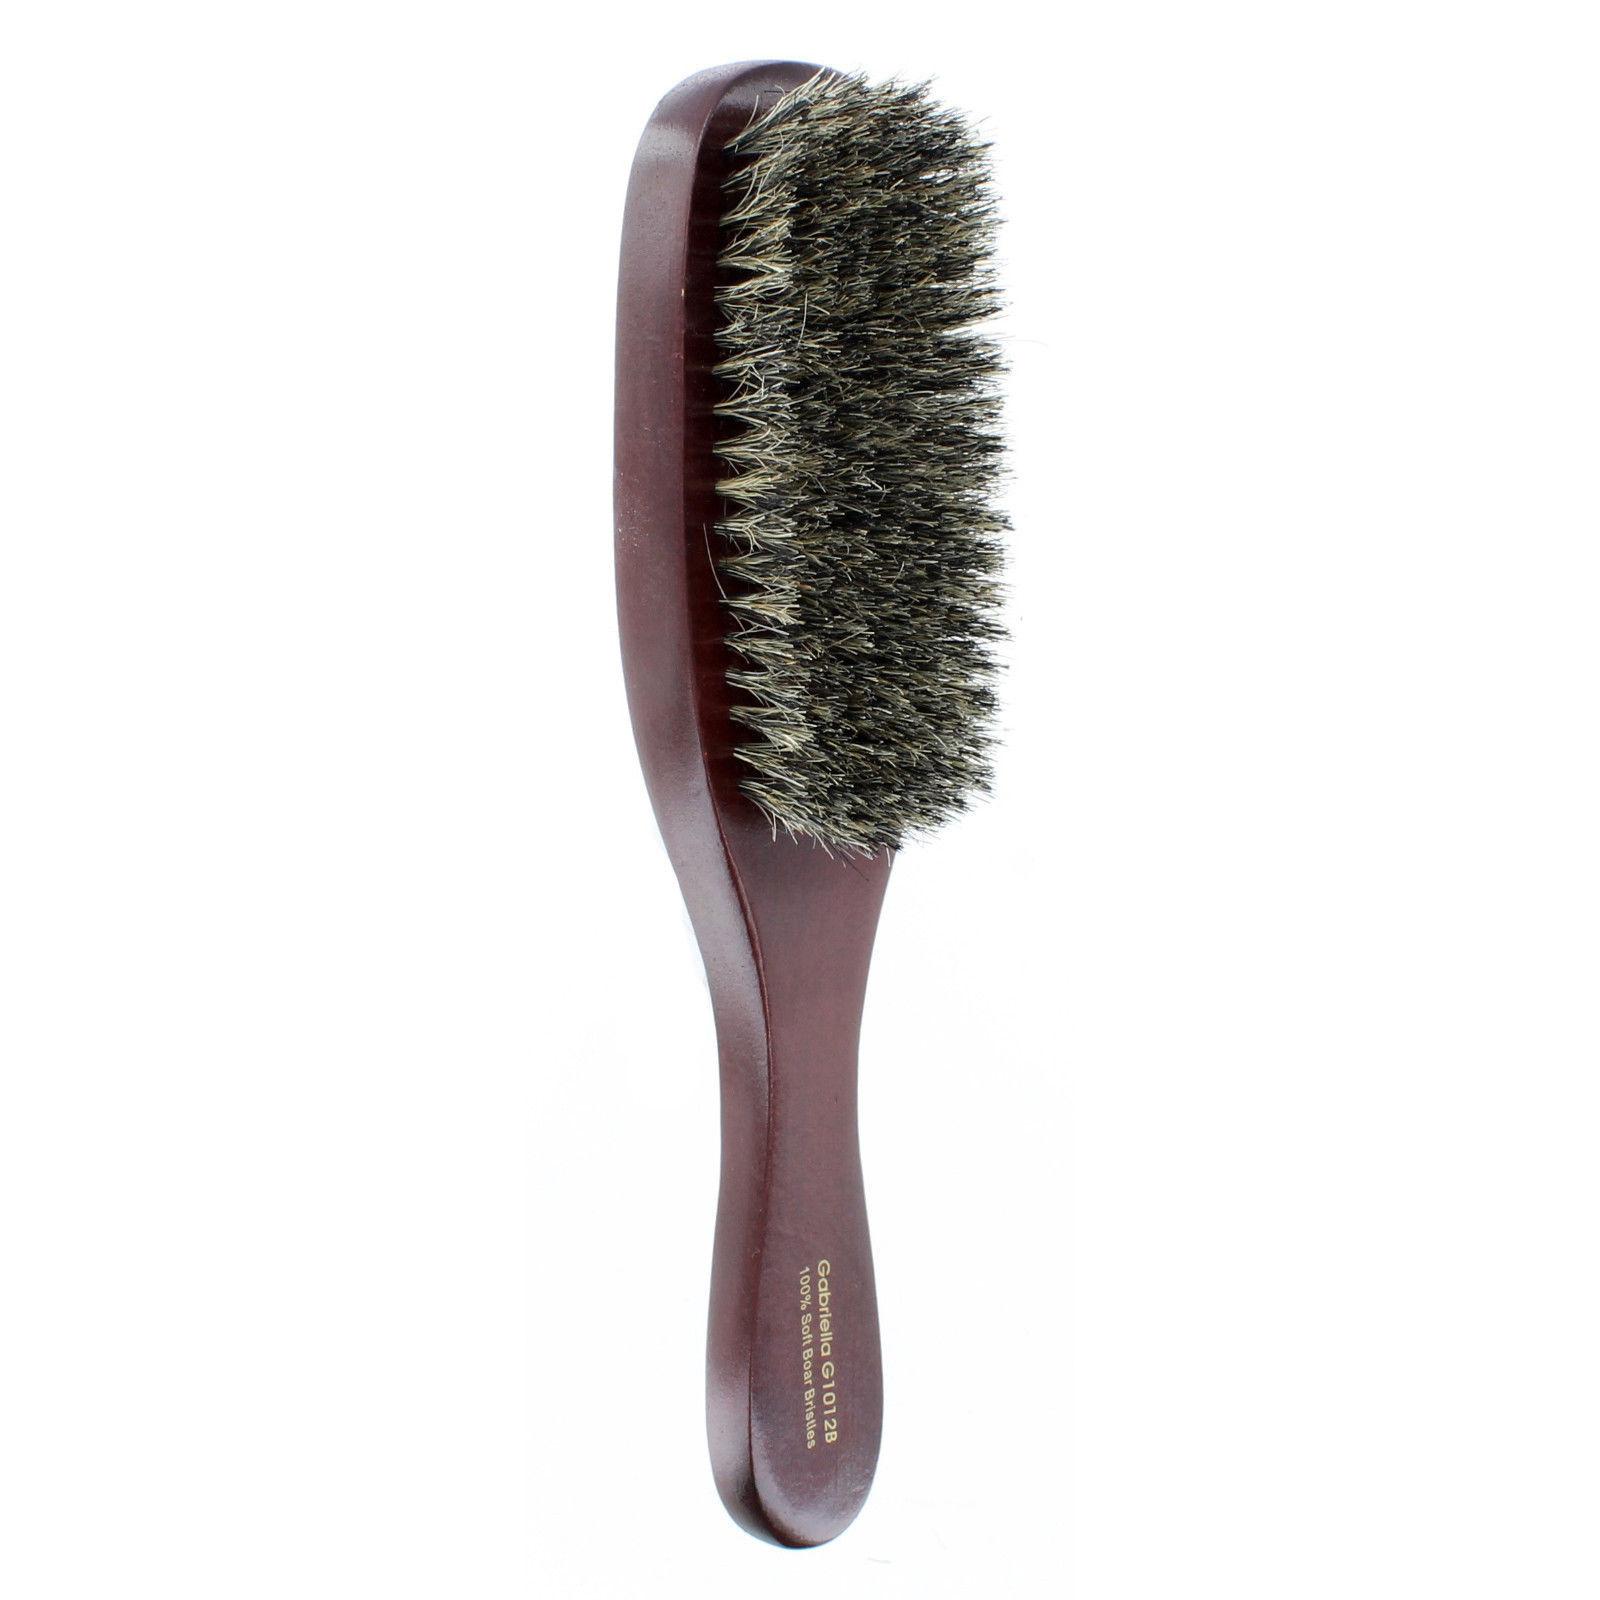 100% Pure Natural Soft Boar Bristle Wave Hair Brush Wood Handle Premium G1012B